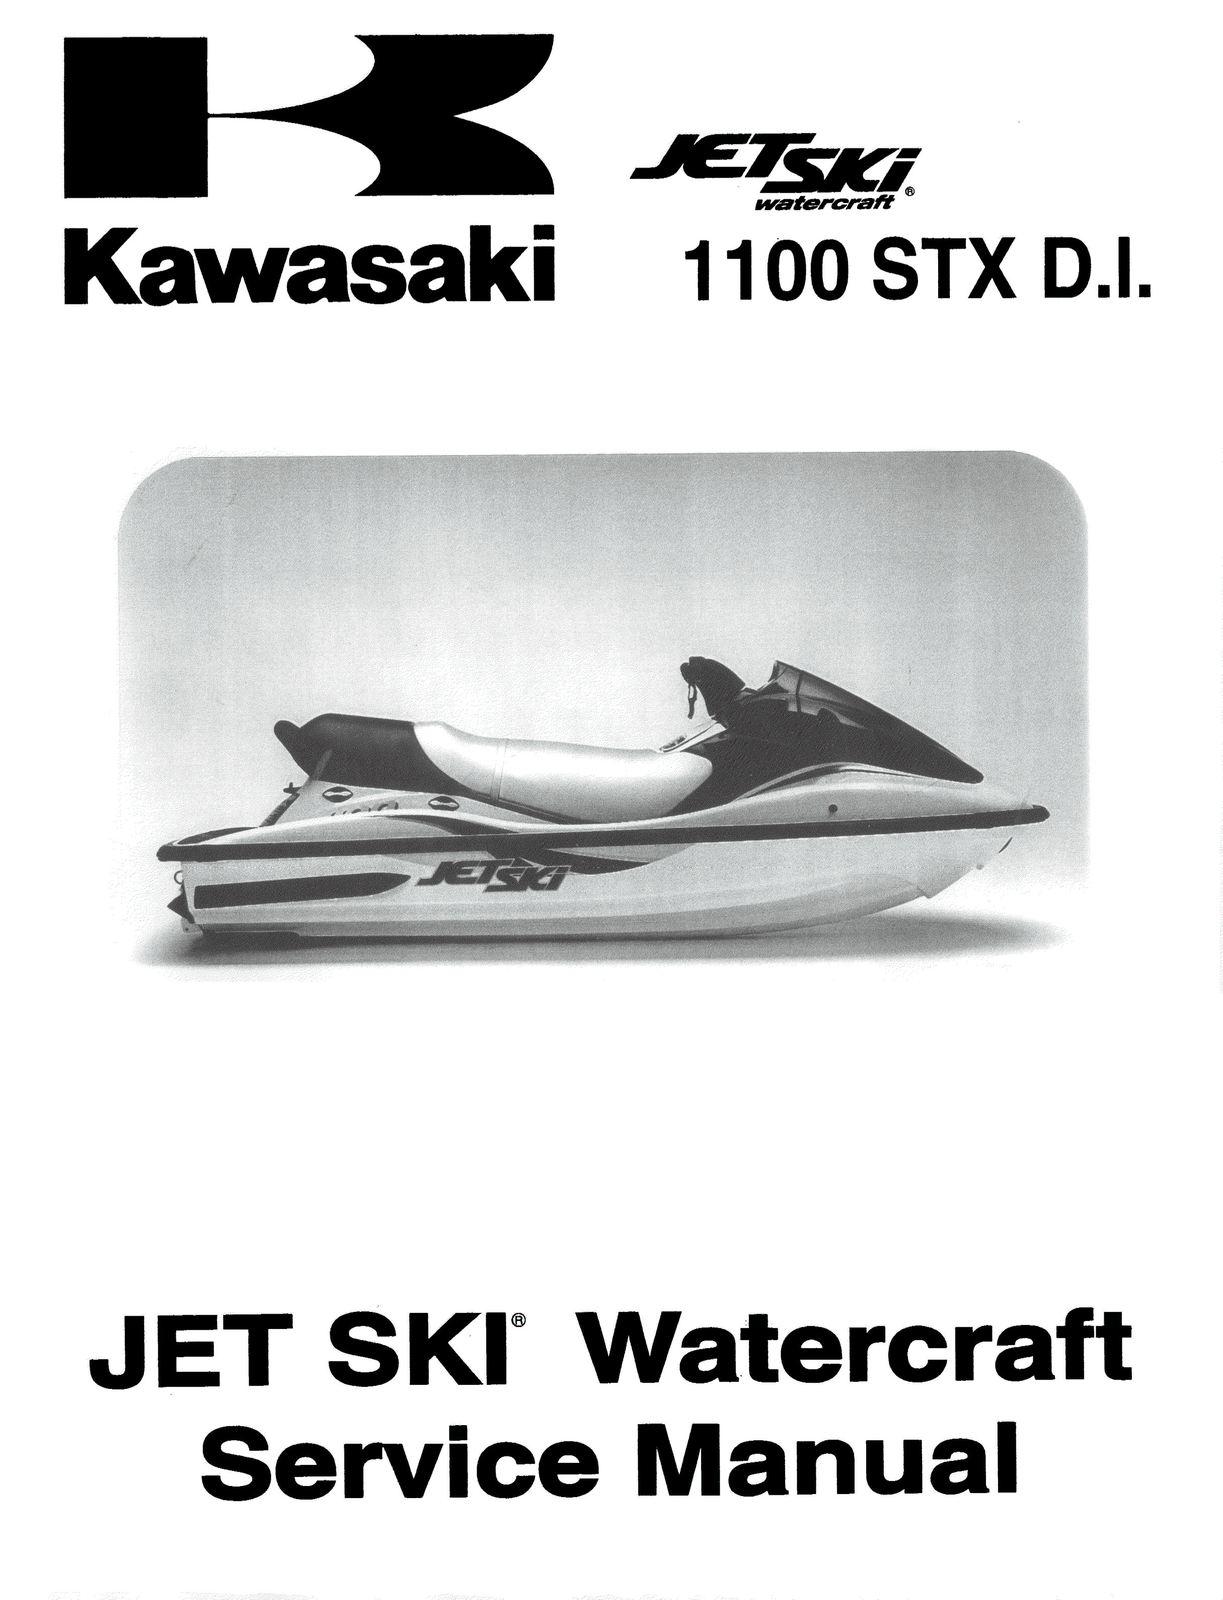 2000 2001 kawasaki jet ski 1100 stx d i and 50 similar items rh bonanza com Kawasaki 1100 LTD kawasaki 1100 stx jet ski owners manual